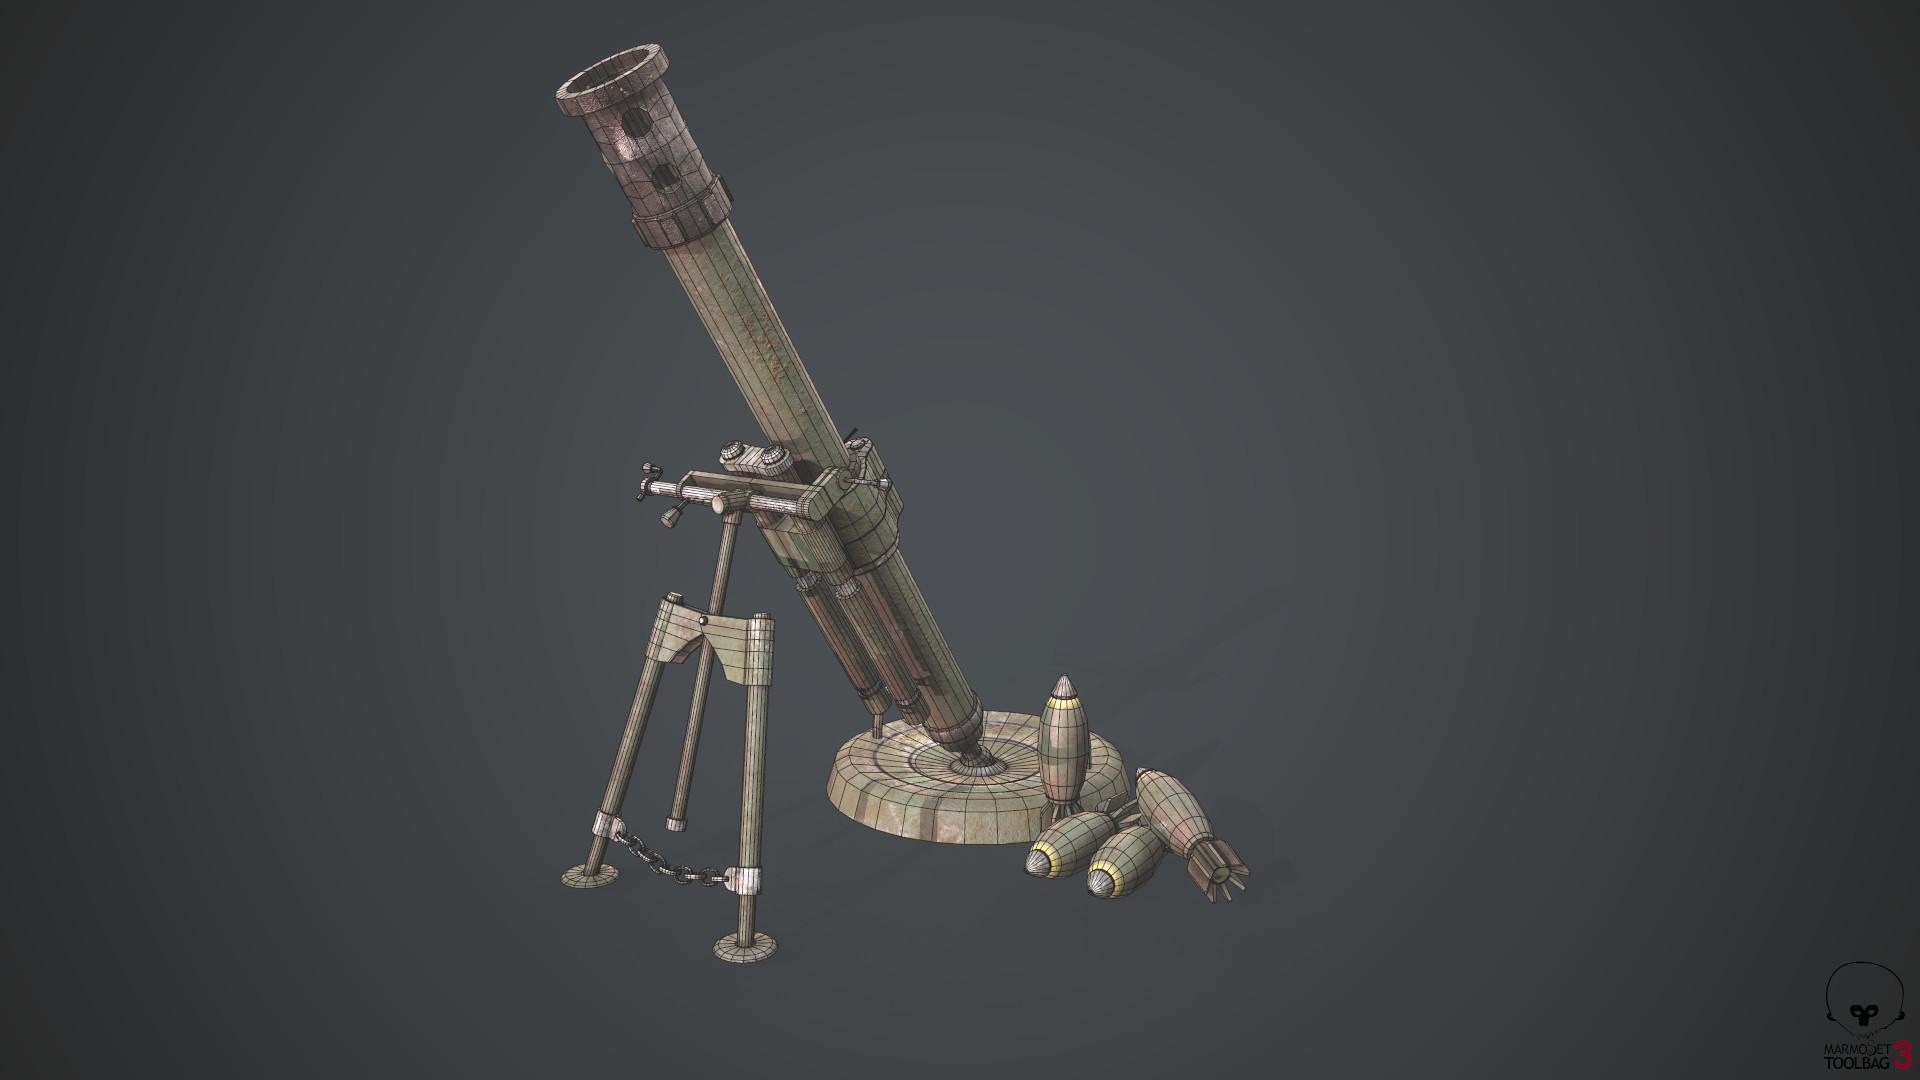 Serdar cendik mortarwiraframe